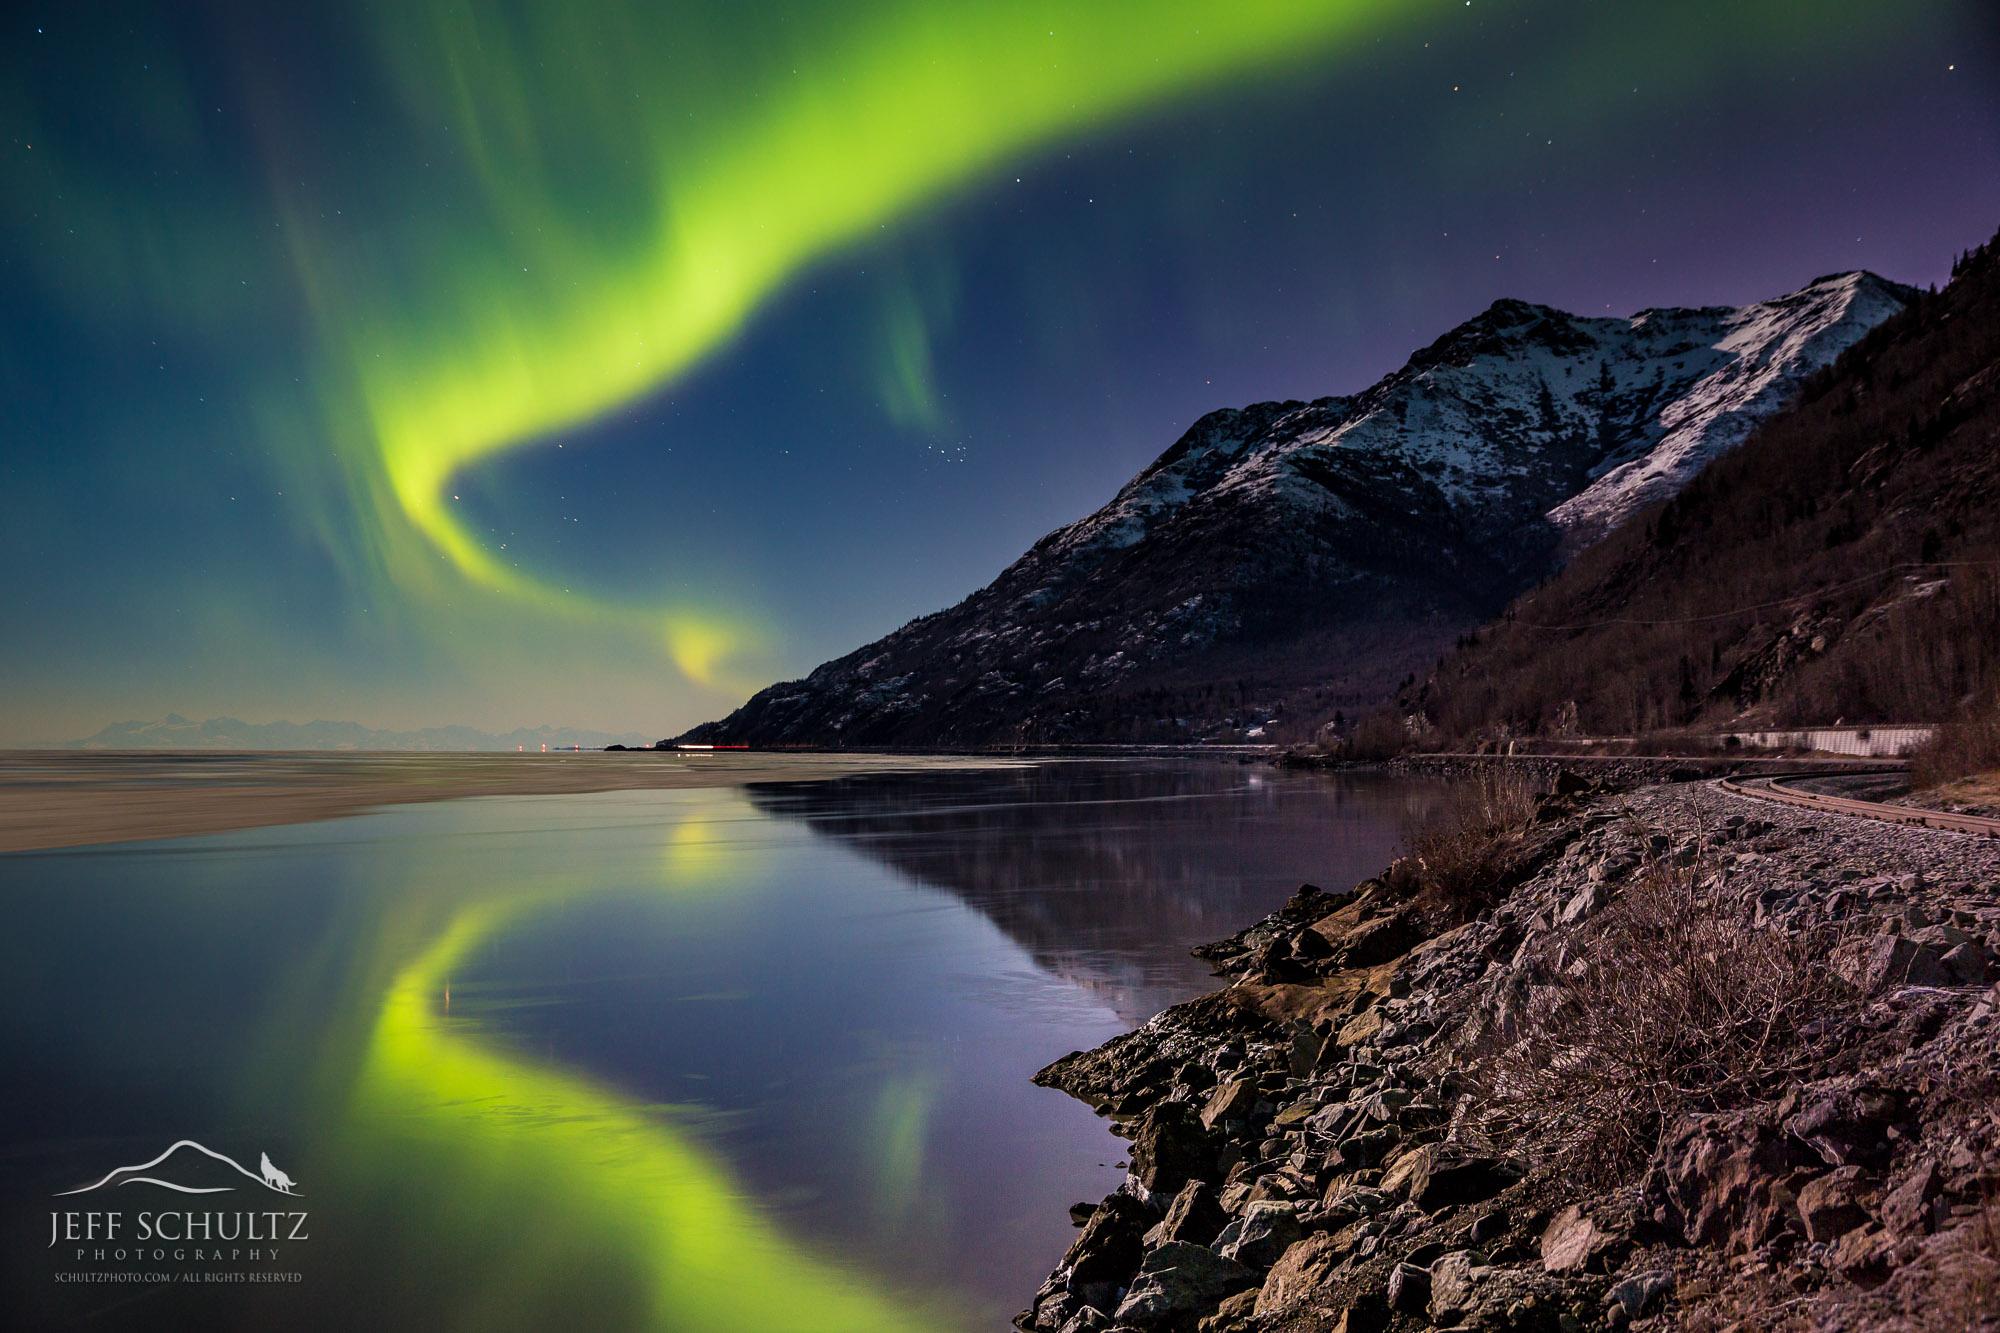 alaska landscape landscapes schultz jeff reflection photographer project nature northern lights schultzphoto